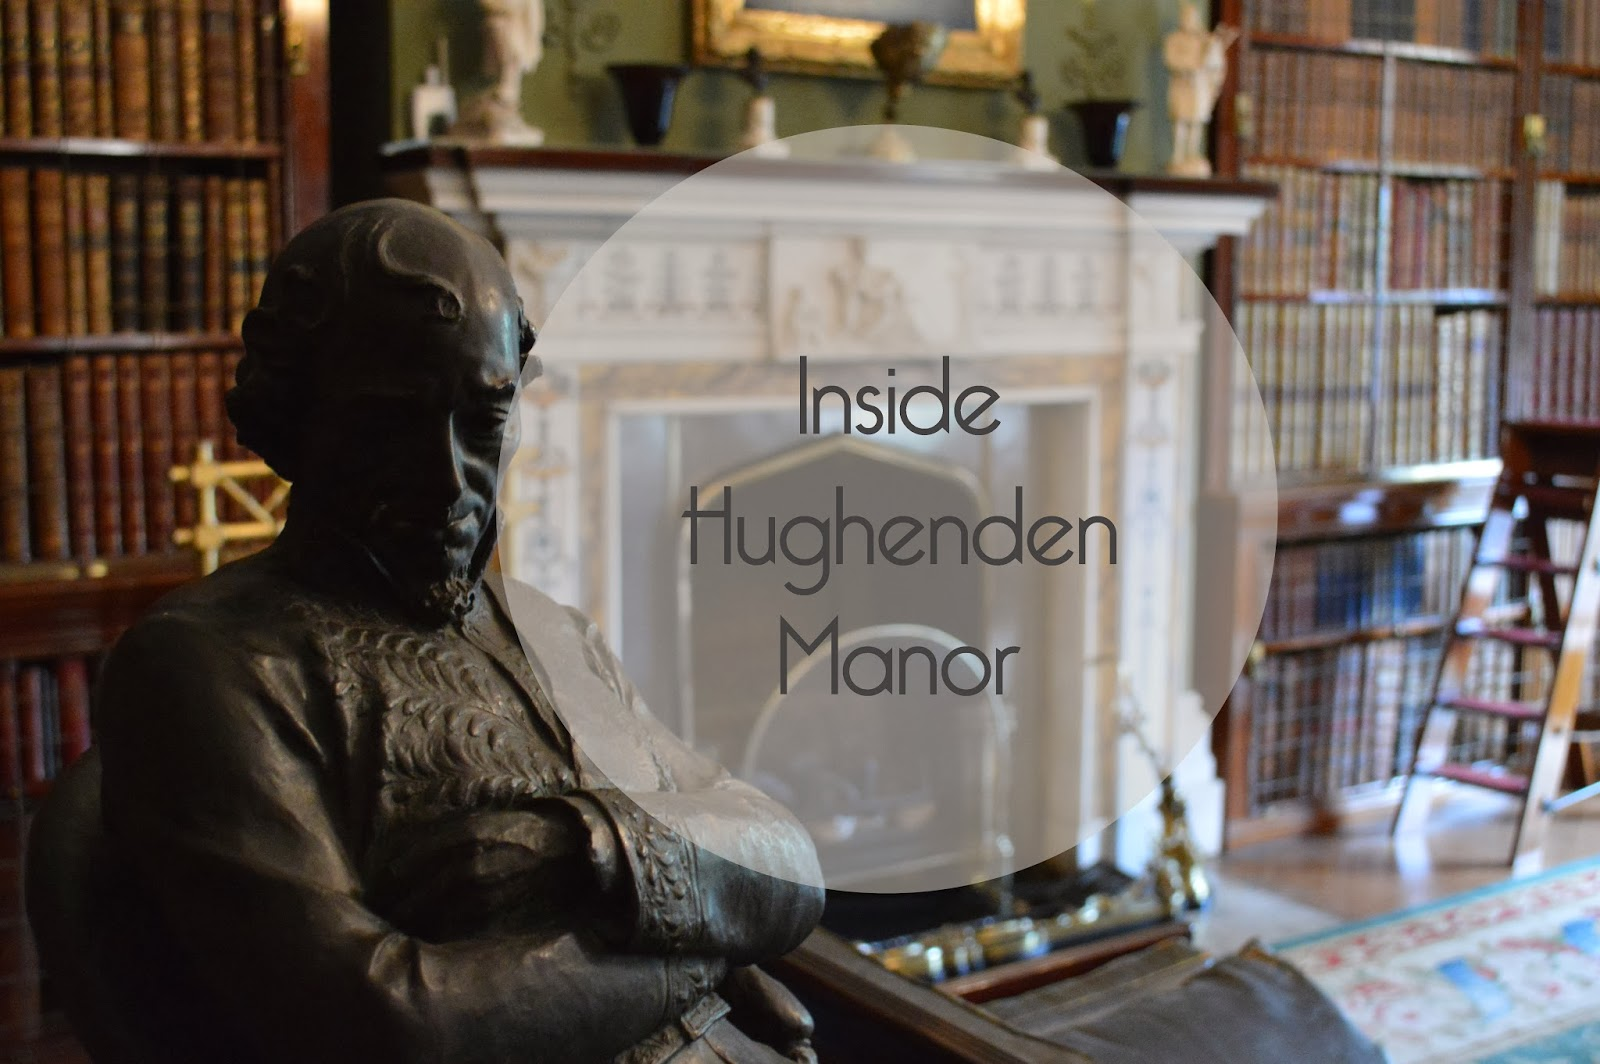 Hughenden Manor, interior, National Trust, 18th century, Victorian, library, visit, Uk, Buckinghamshire, photo, photography, inside,